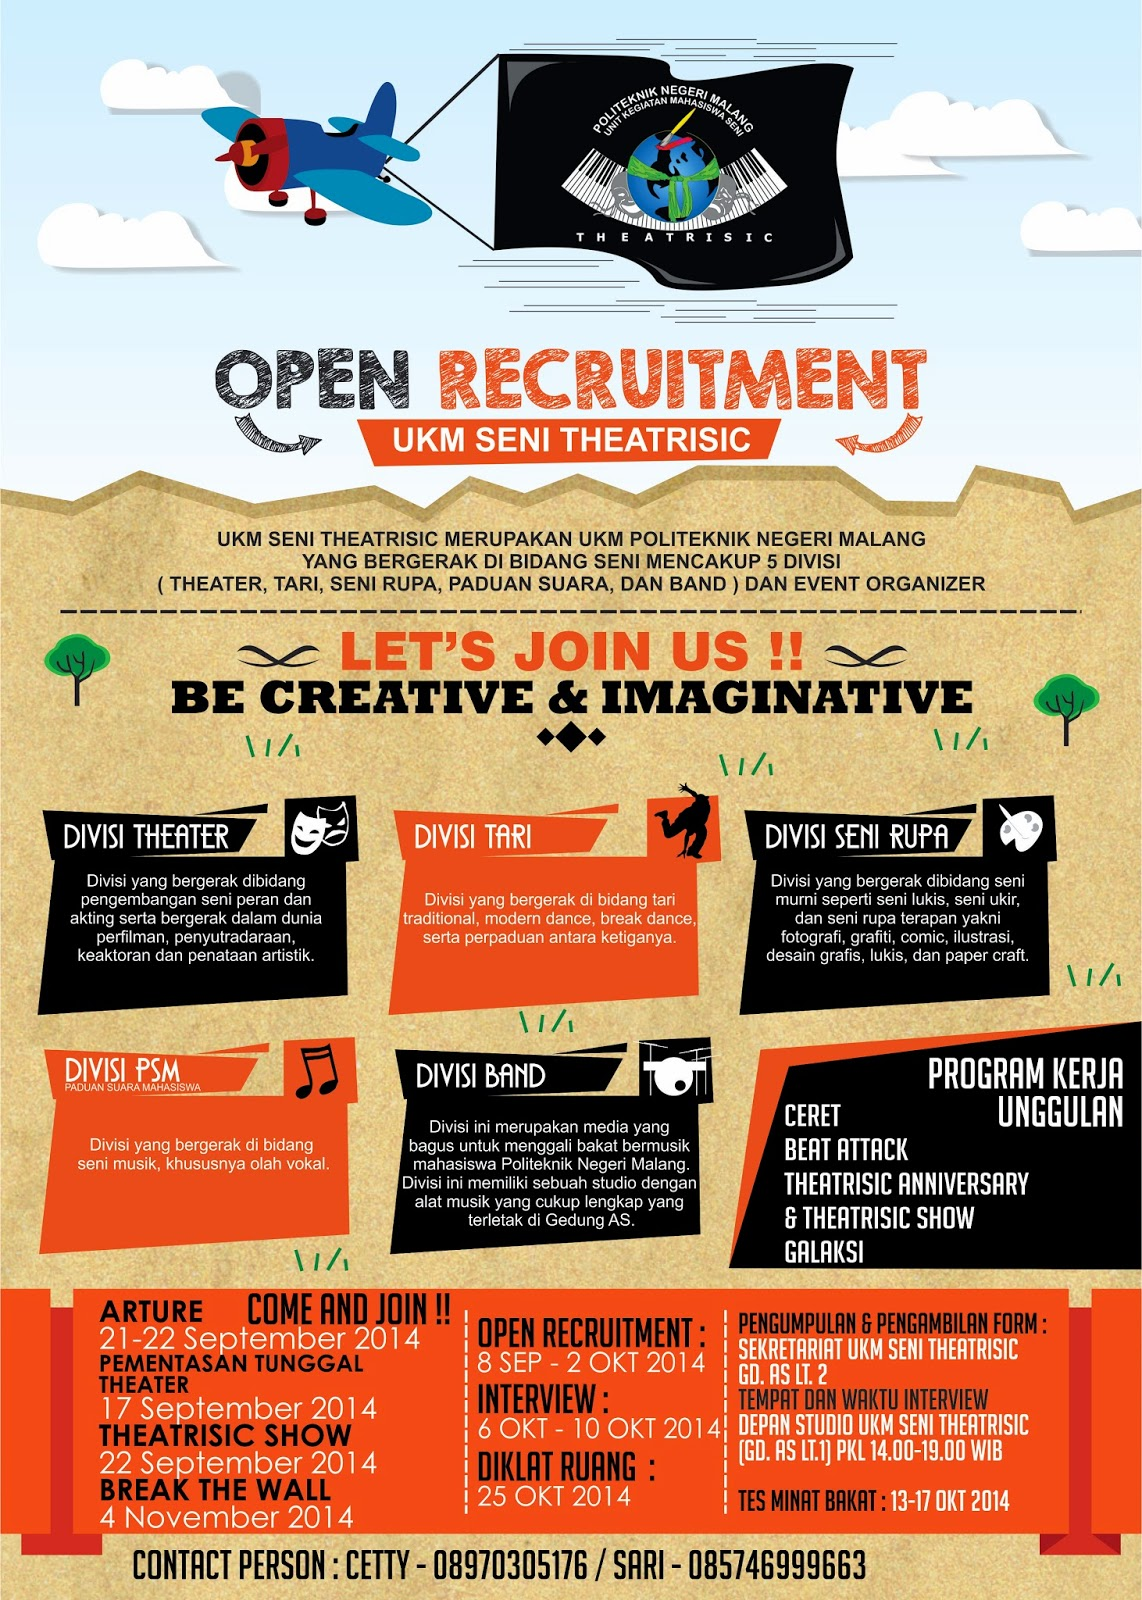 Open Recruitment Ukm Seni Theatrisic Seni Theatrisic